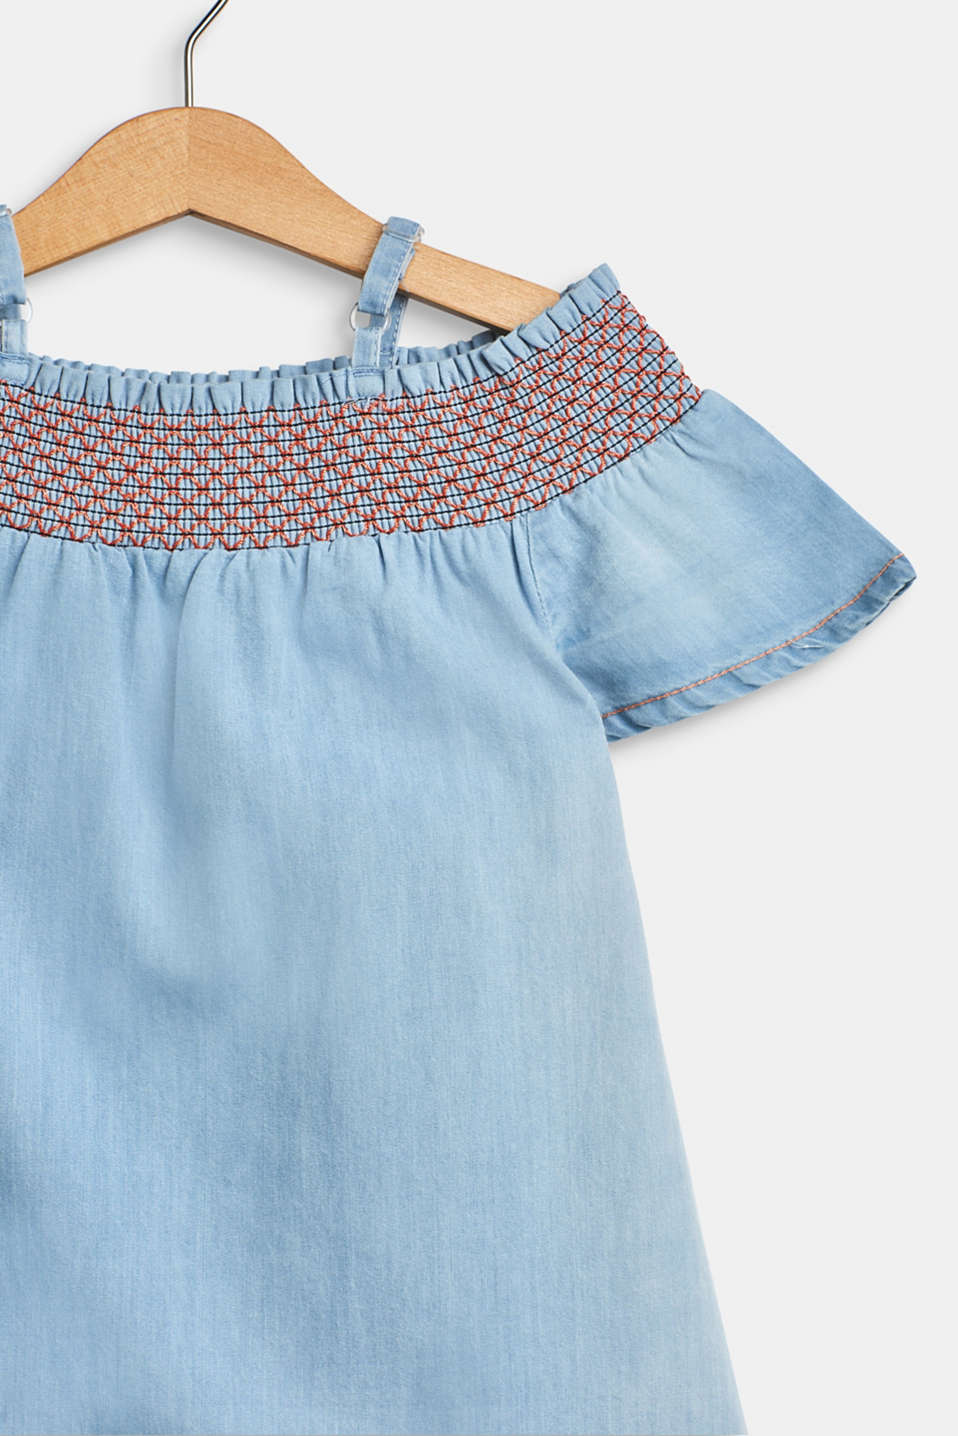 Off-the-shoulder dress in a denim look, 100% cotton, BLUE LIGHT WAS, detail image number 2